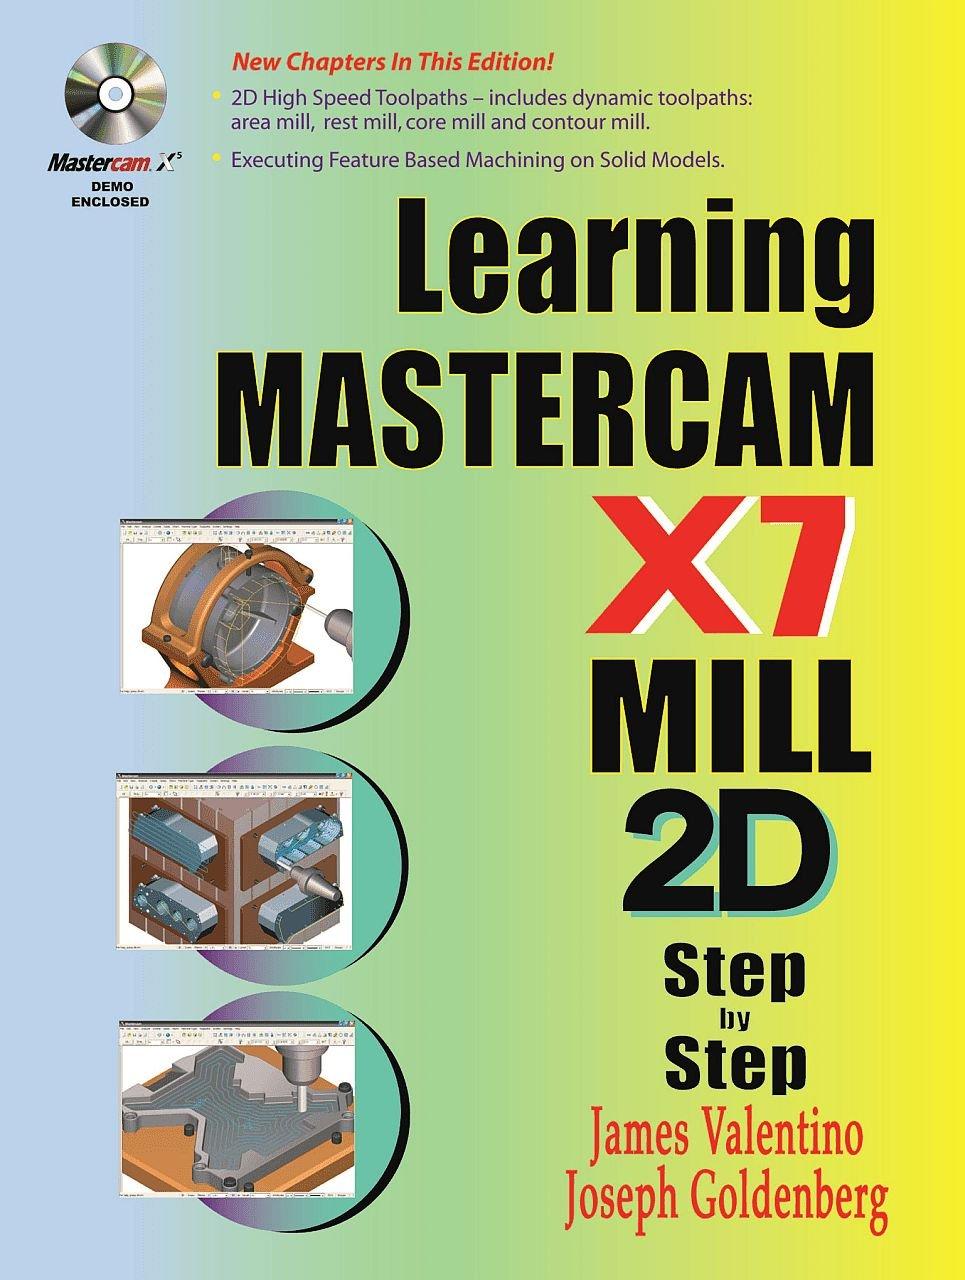 learning mastercam x7 mill 2d step by step james valentino joseph rh amazon com Iscar Mastercam Tool Library Mastercam X6 Mill